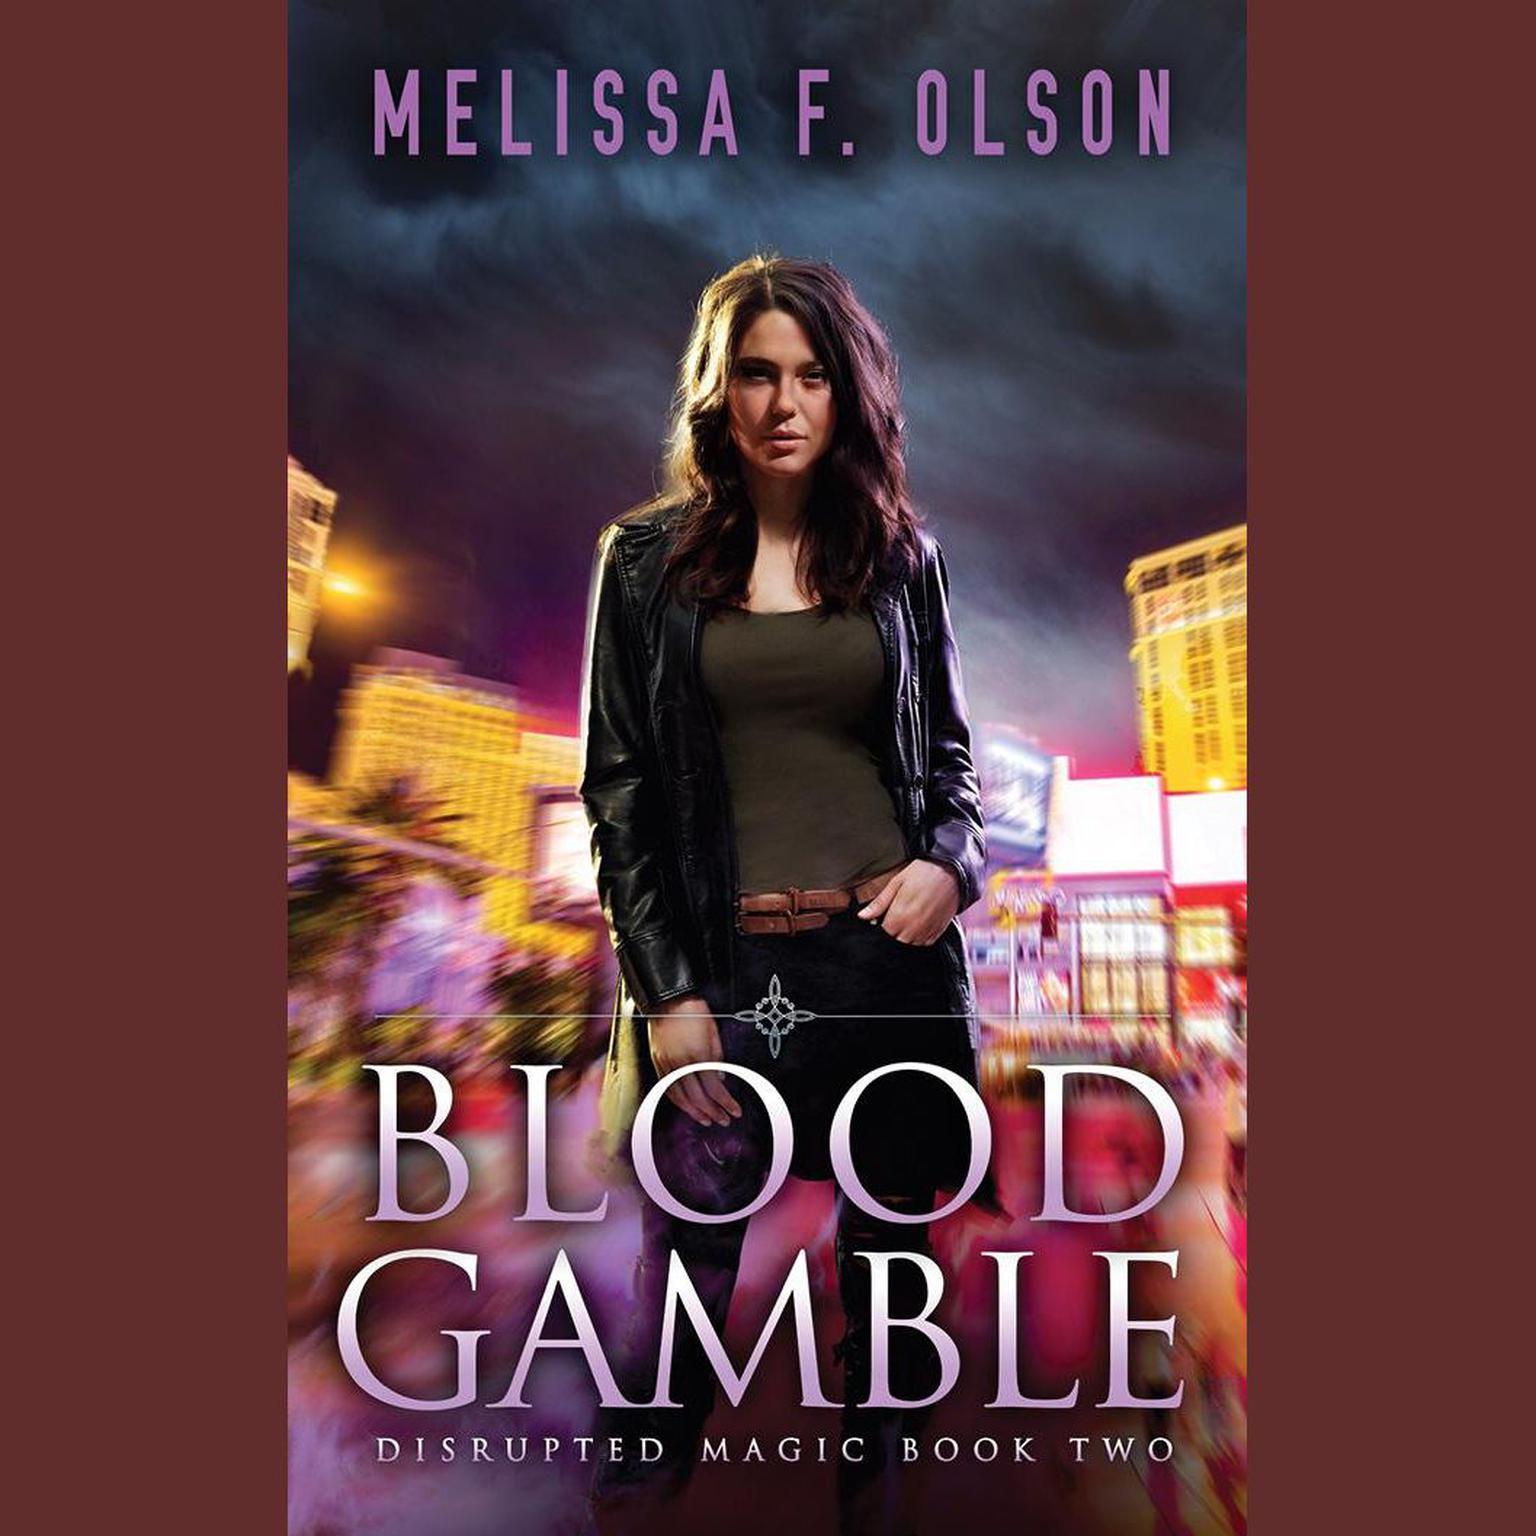 Blood Gamble Audiobook, by Melissa F. Olson